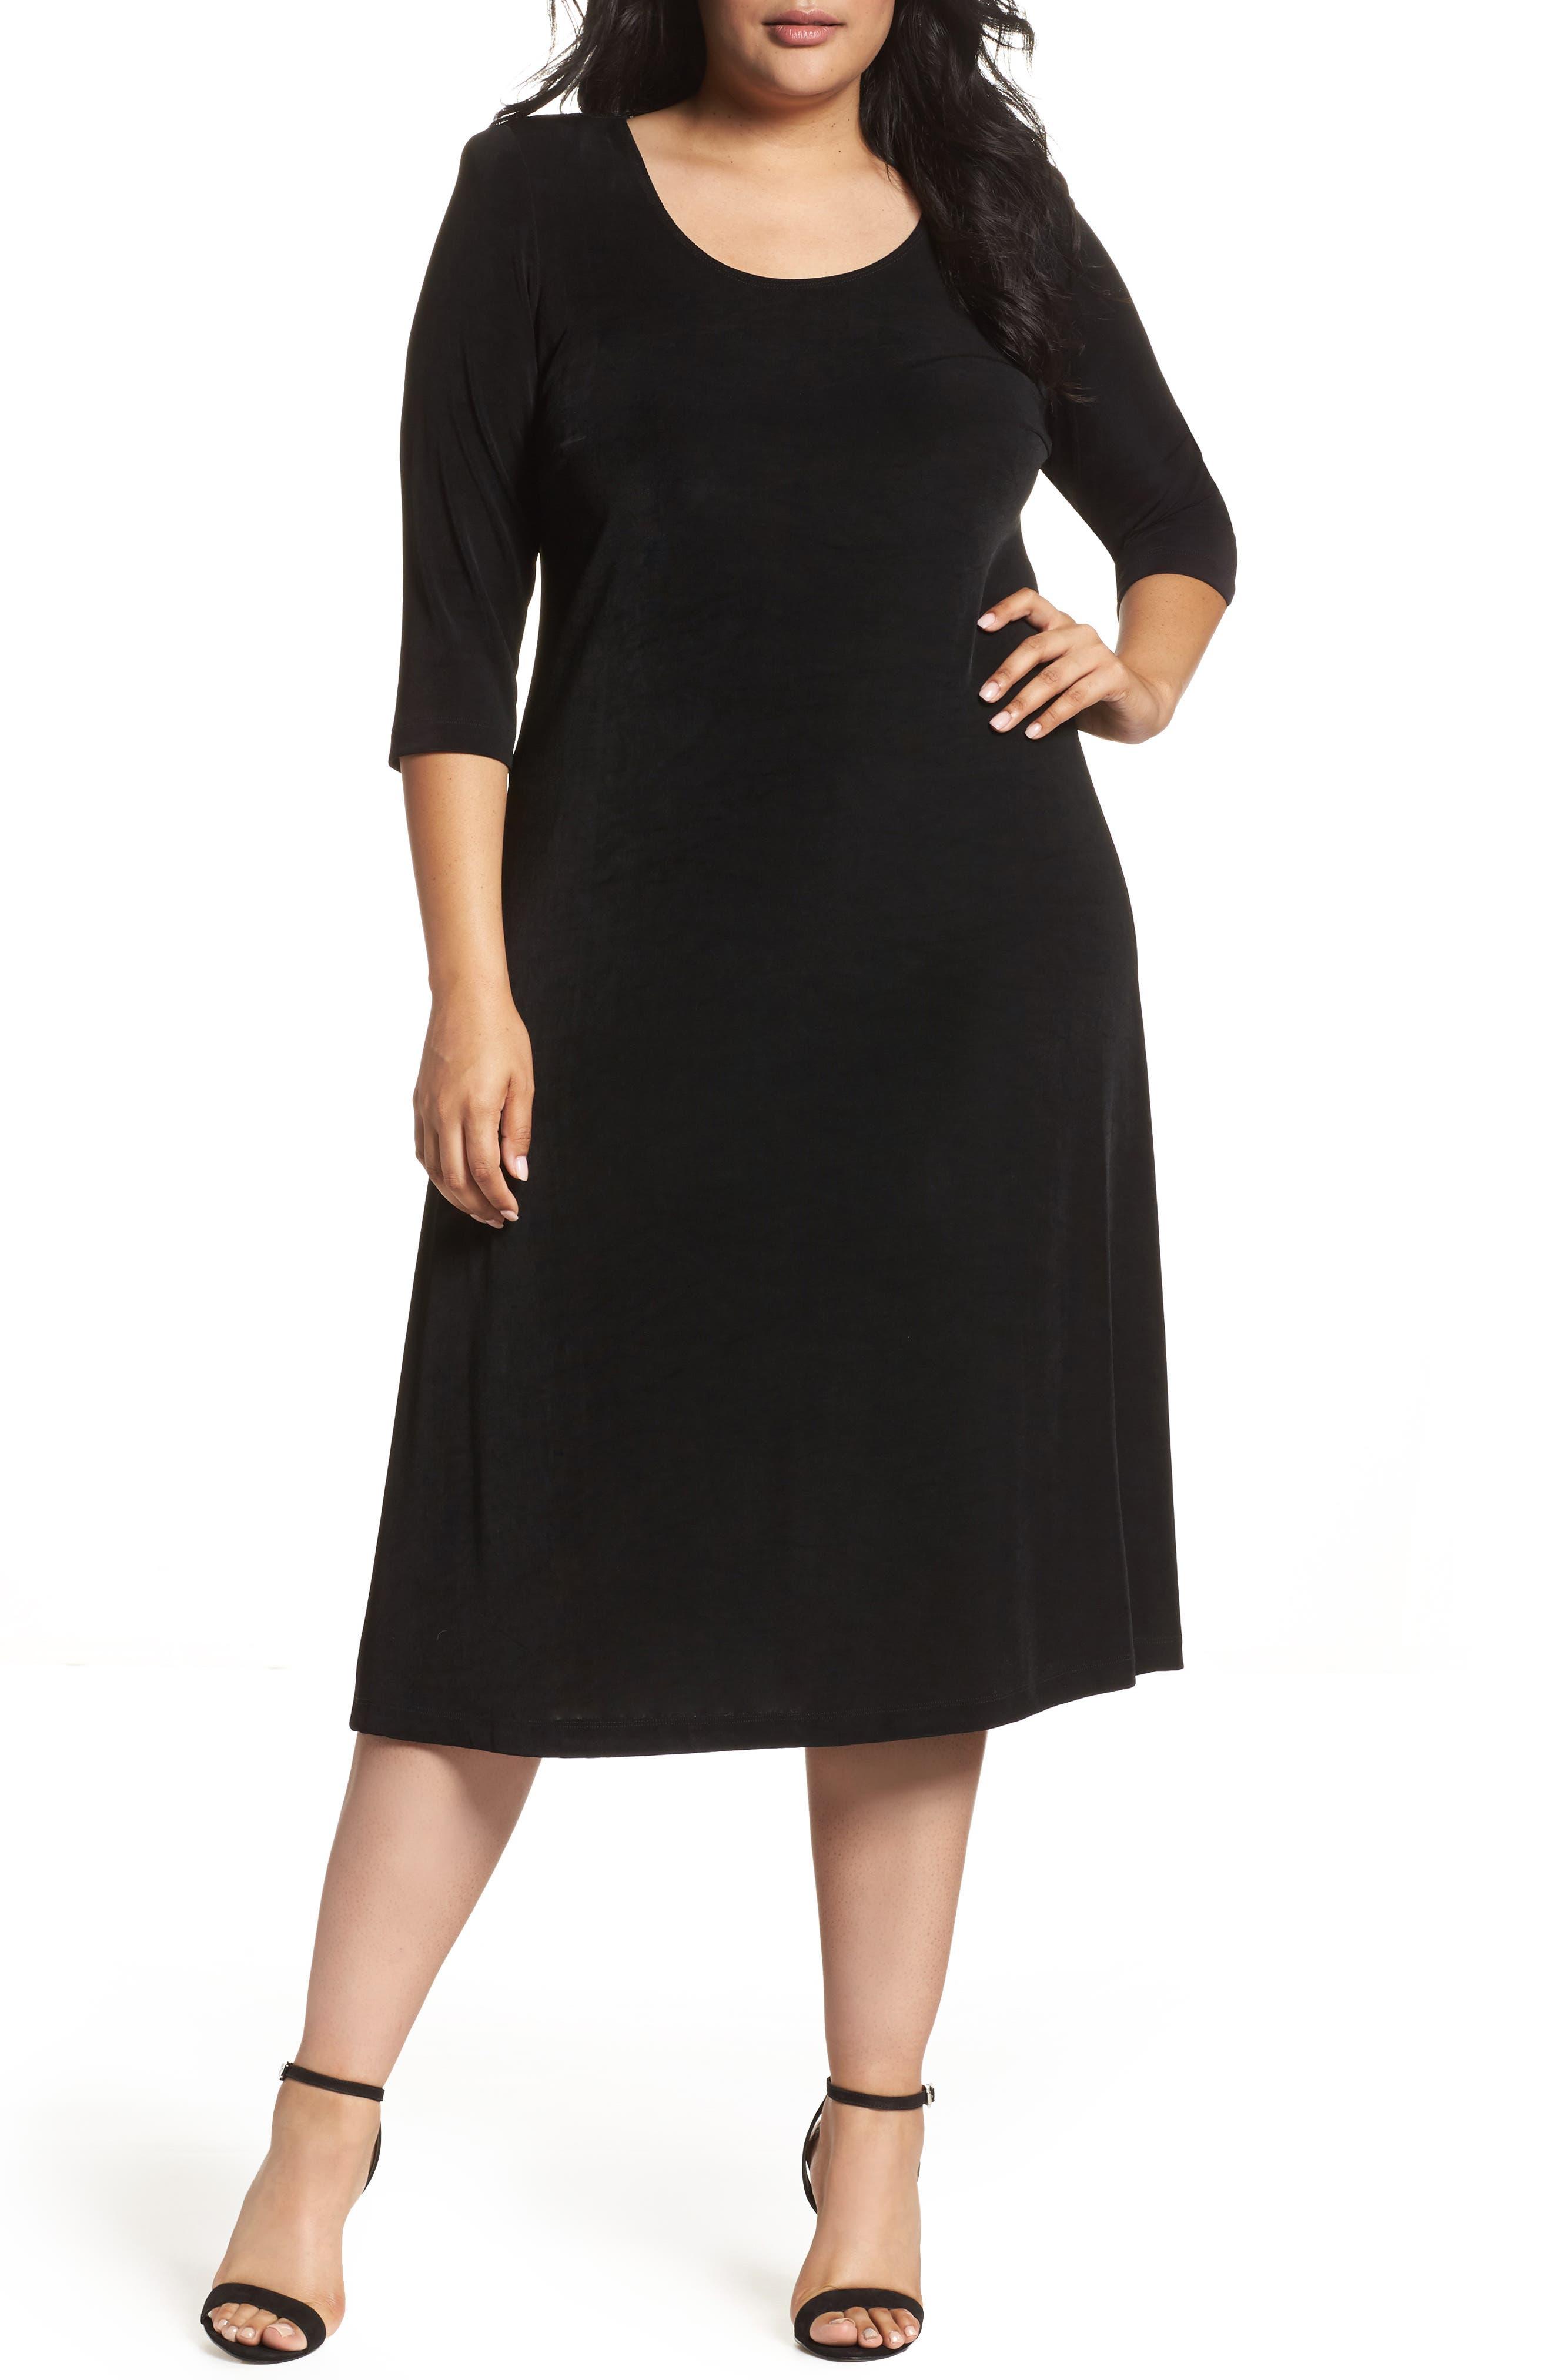 Alternate Image 1 Selected - Vikki Vi Three-Quarter Sleeve Stretch Knit A-Line Dress (Plus Size)